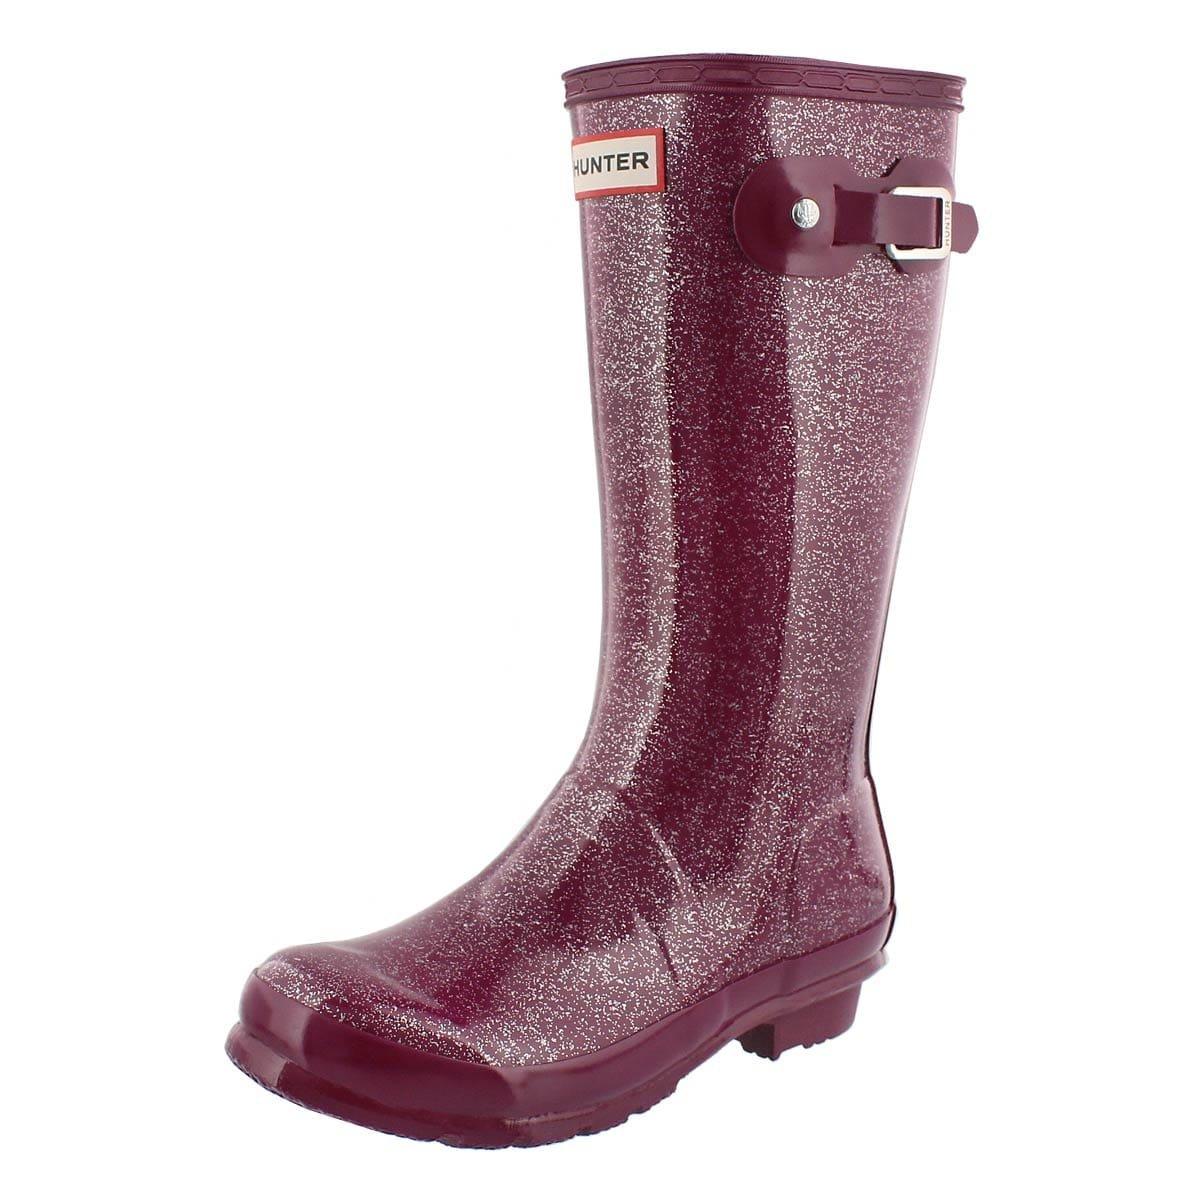 Hunter Boots Girls Original Kids Glitter Rain Boot Violet 5 M Us